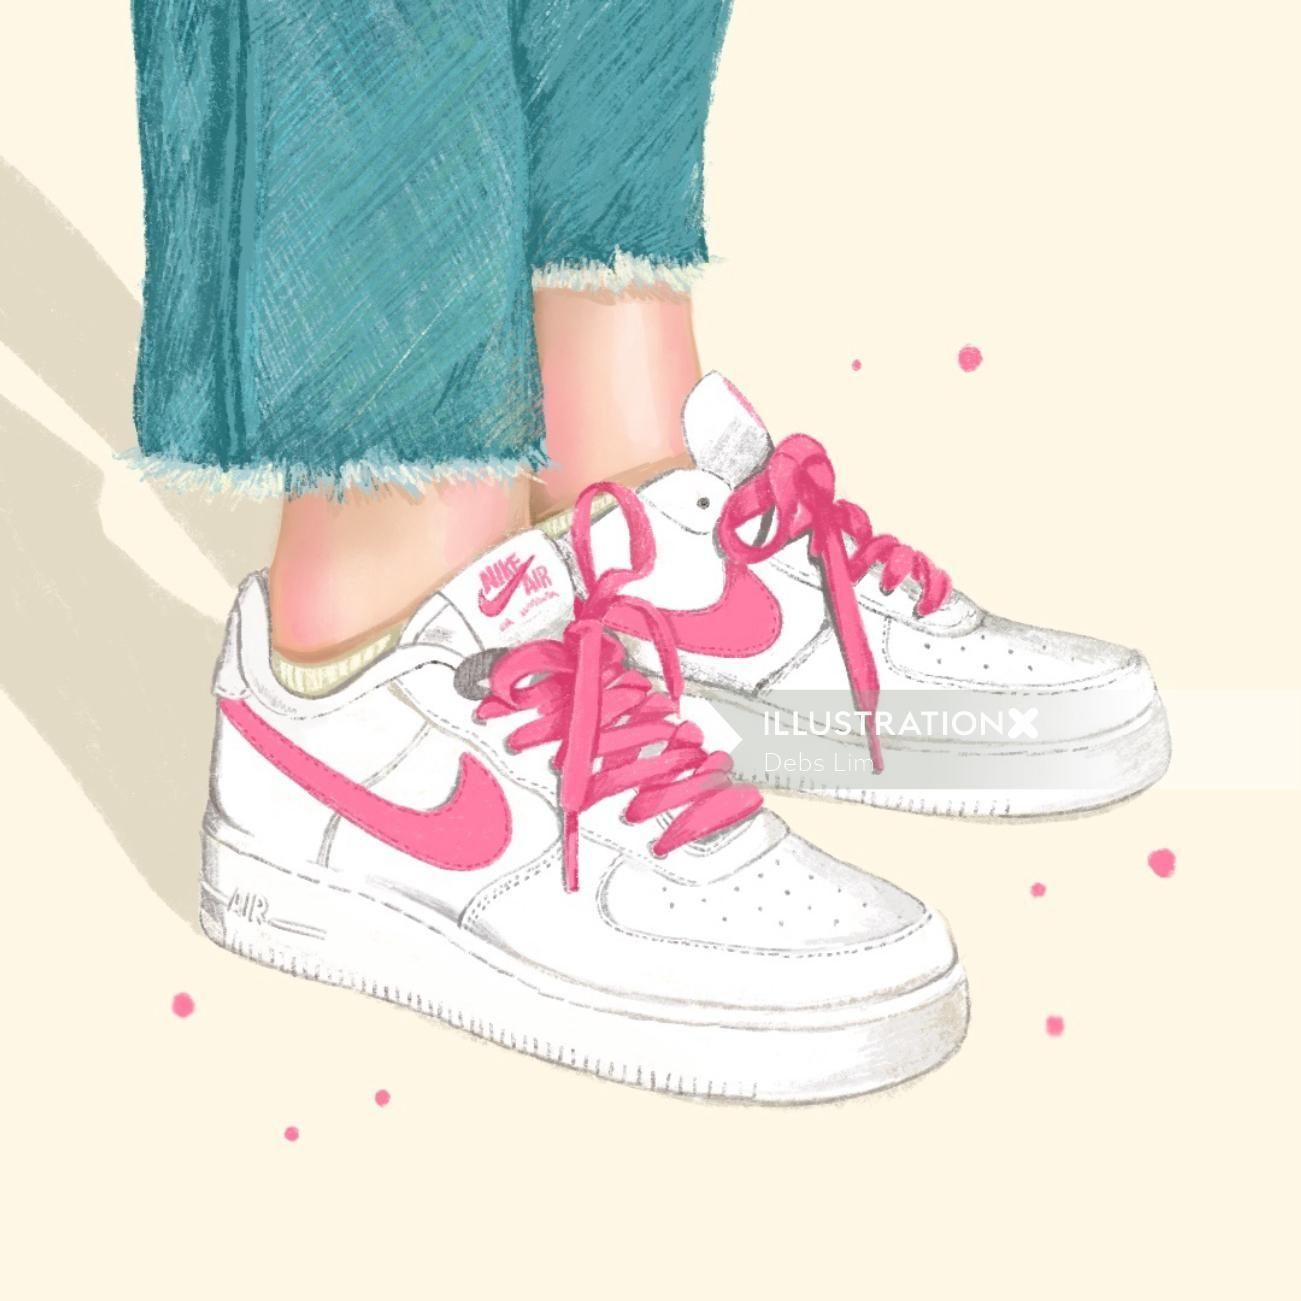 Nike Sneaker Cartoon Illustration